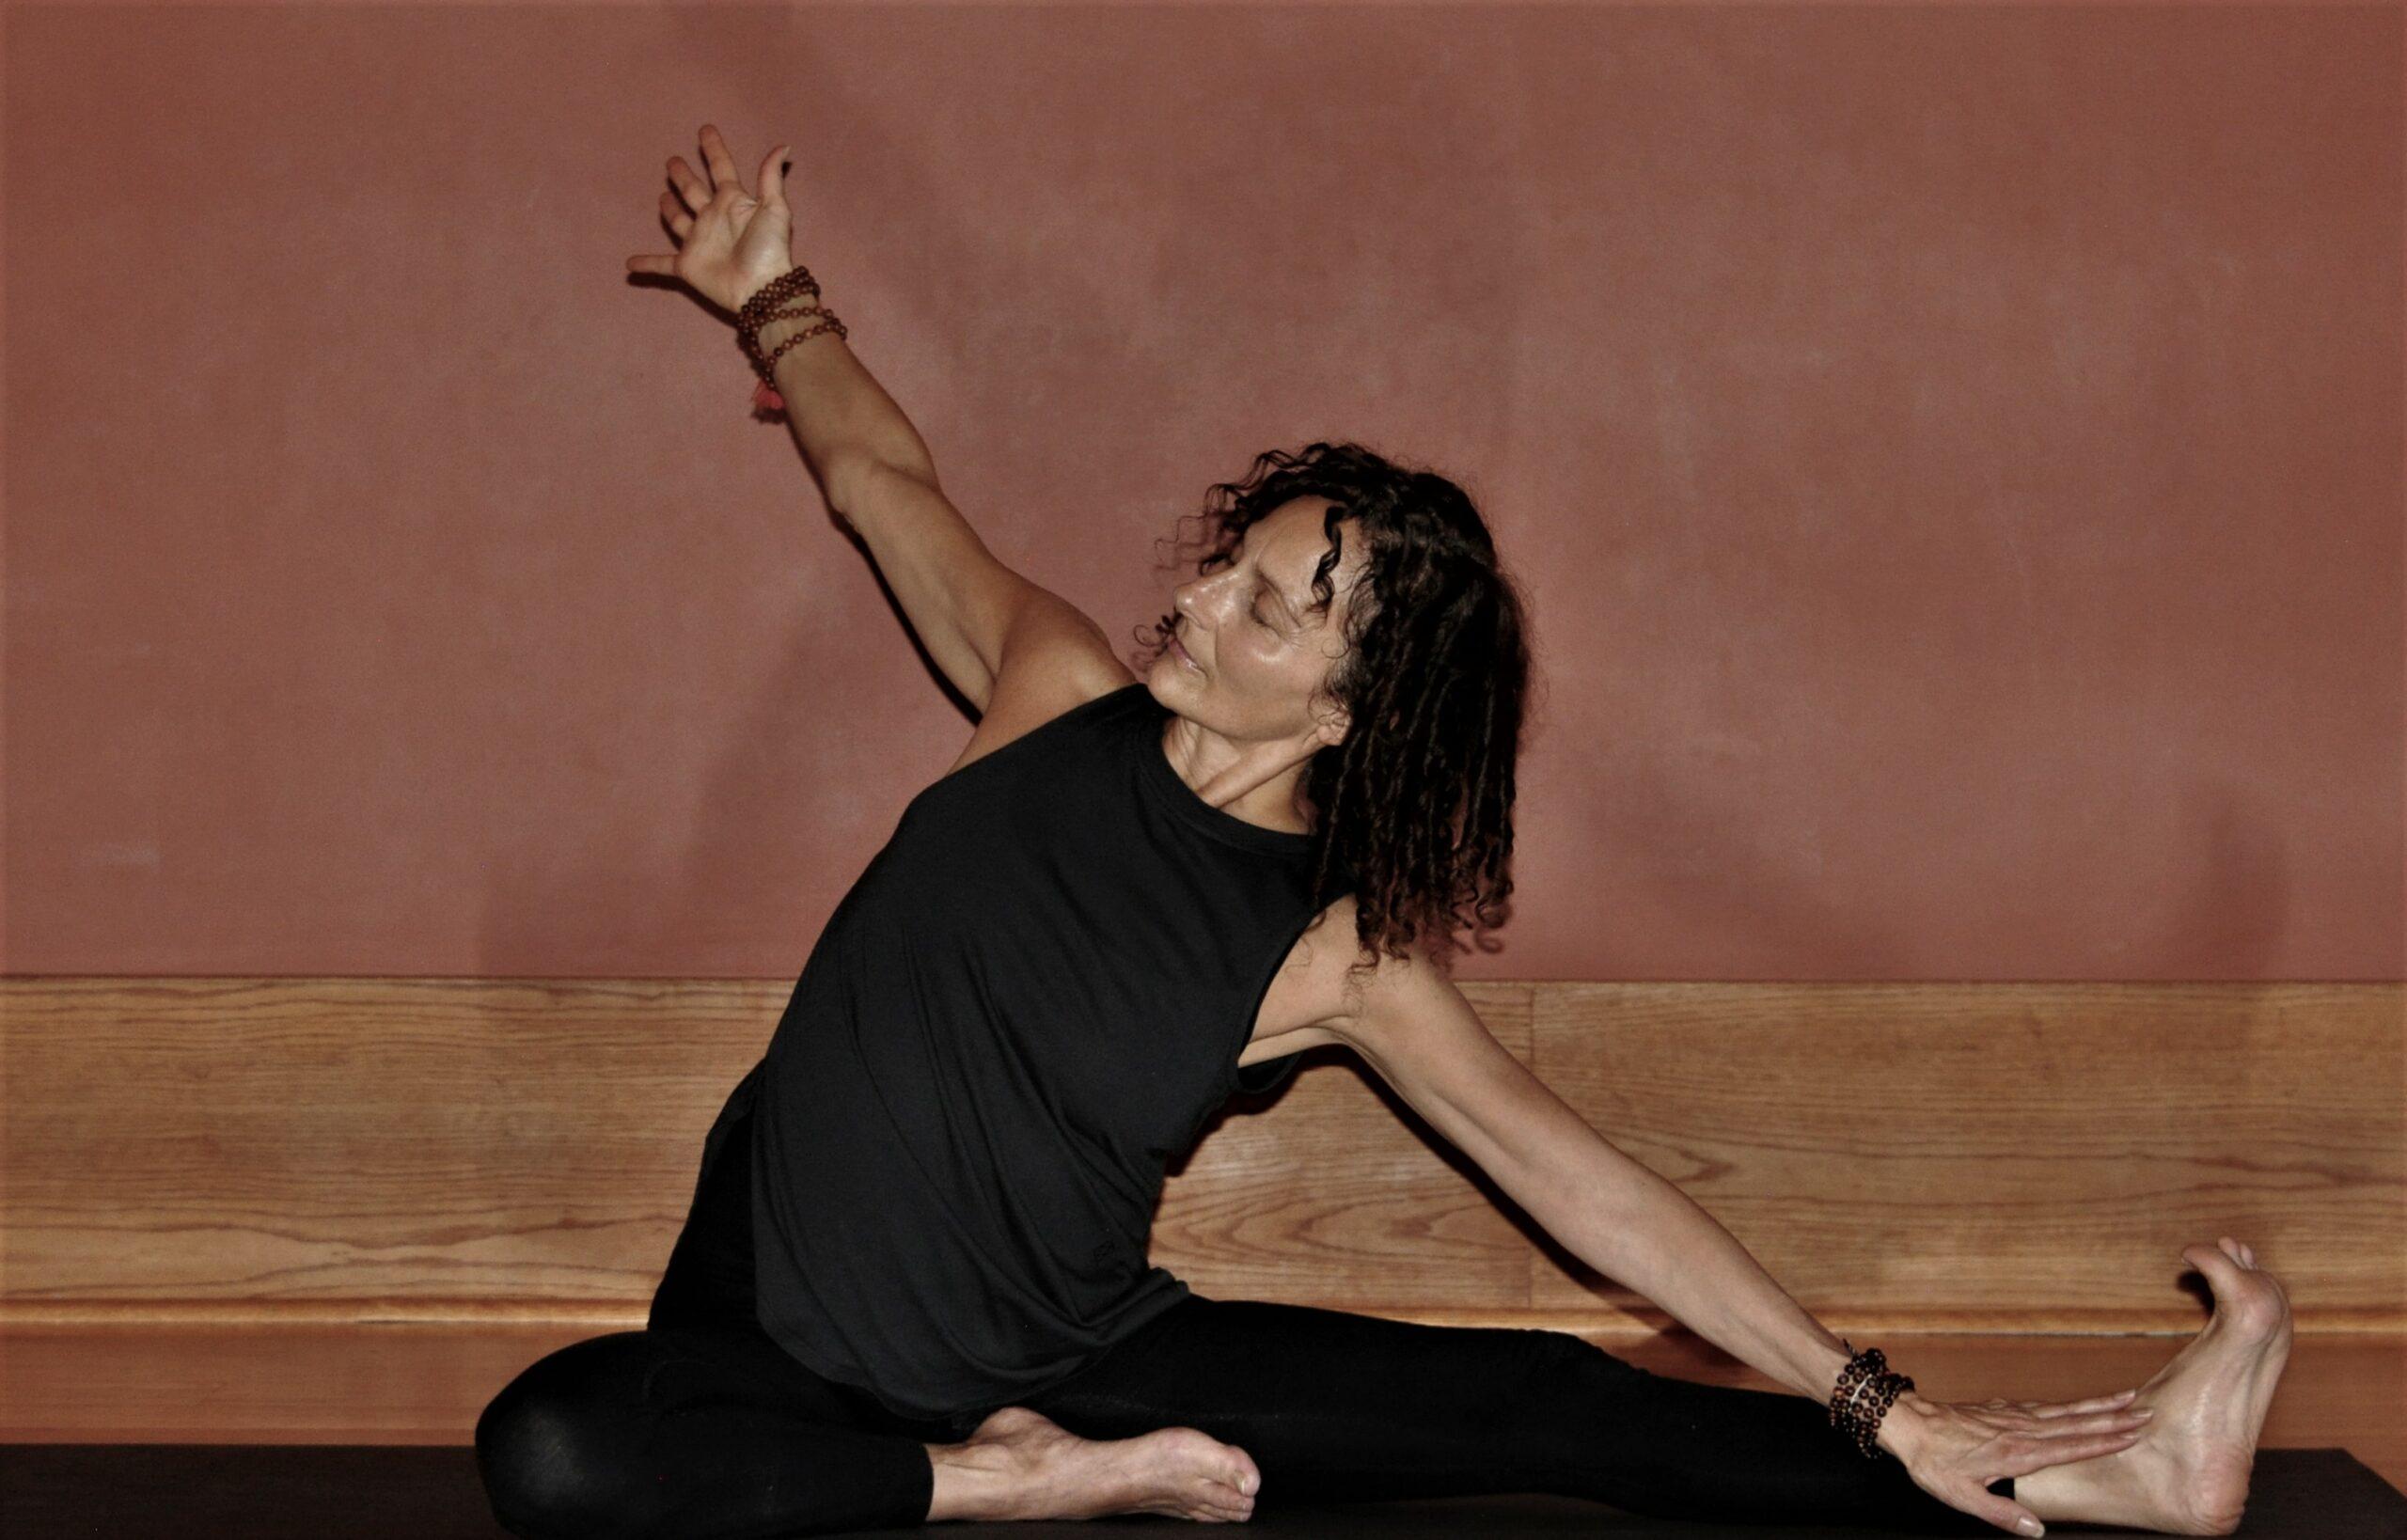 Yoga Teacher, Carrie Coppola, Owner